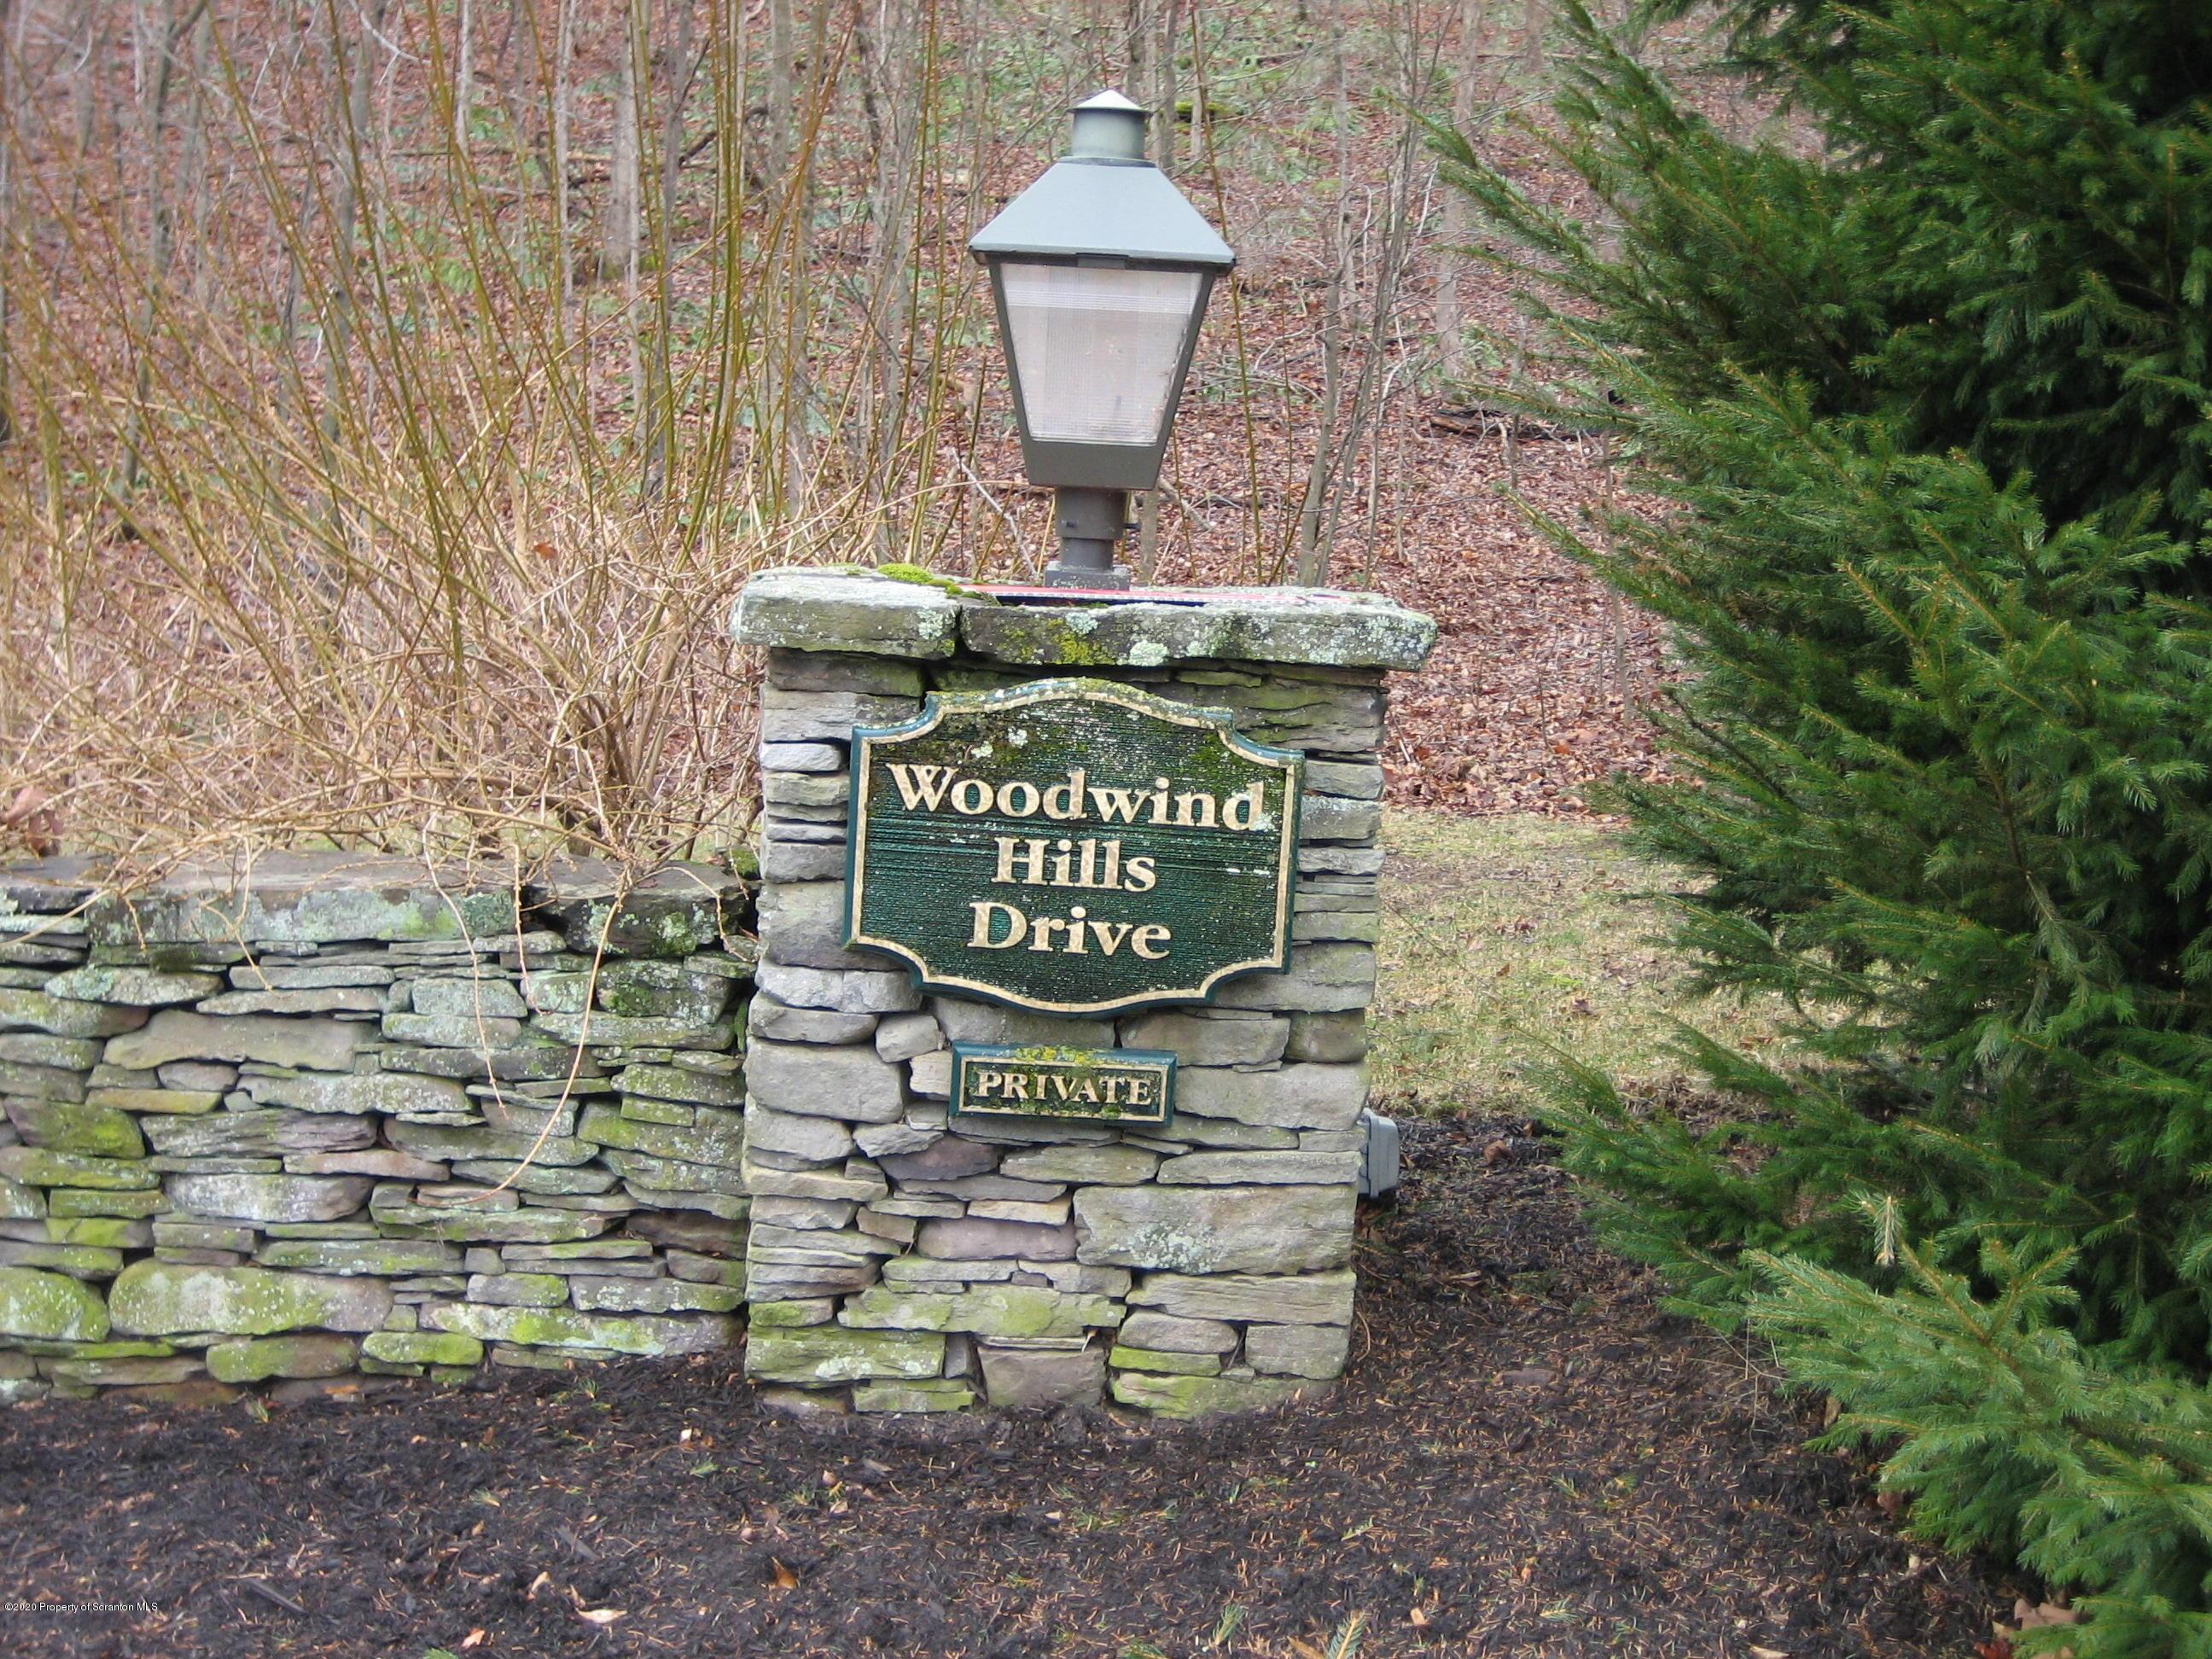 1015 Woodwind Hills Dr, Dalton, Pennsylvania 18414, ,Land,For Sale,Woodwind Hills,20-829